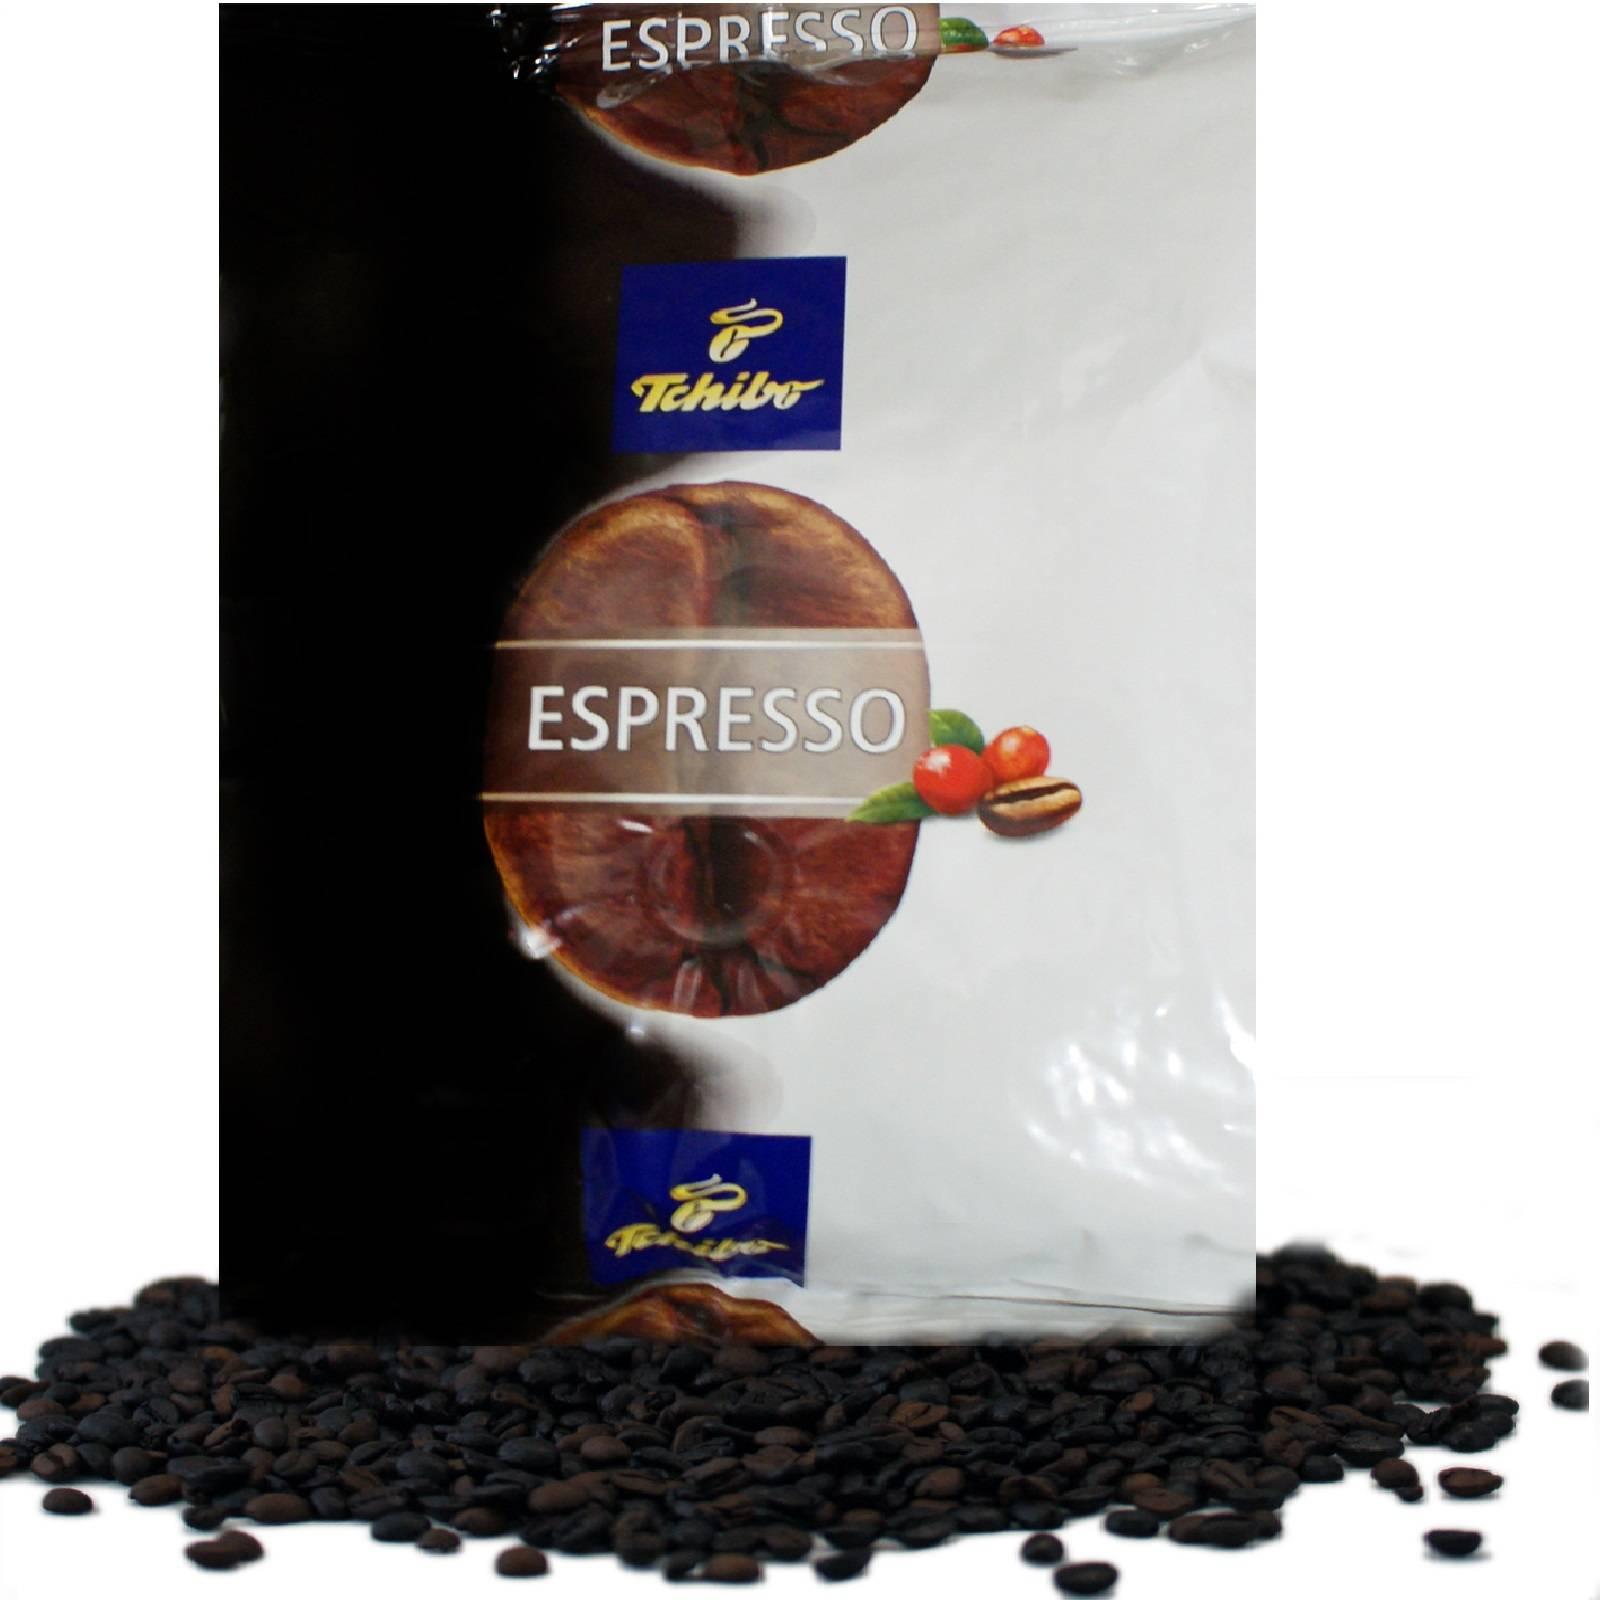 tchibo espresso caf speciale 500g kaffee bohnen kaufen bei. Black Bedroom Furniture Sets. Home Design Ideas